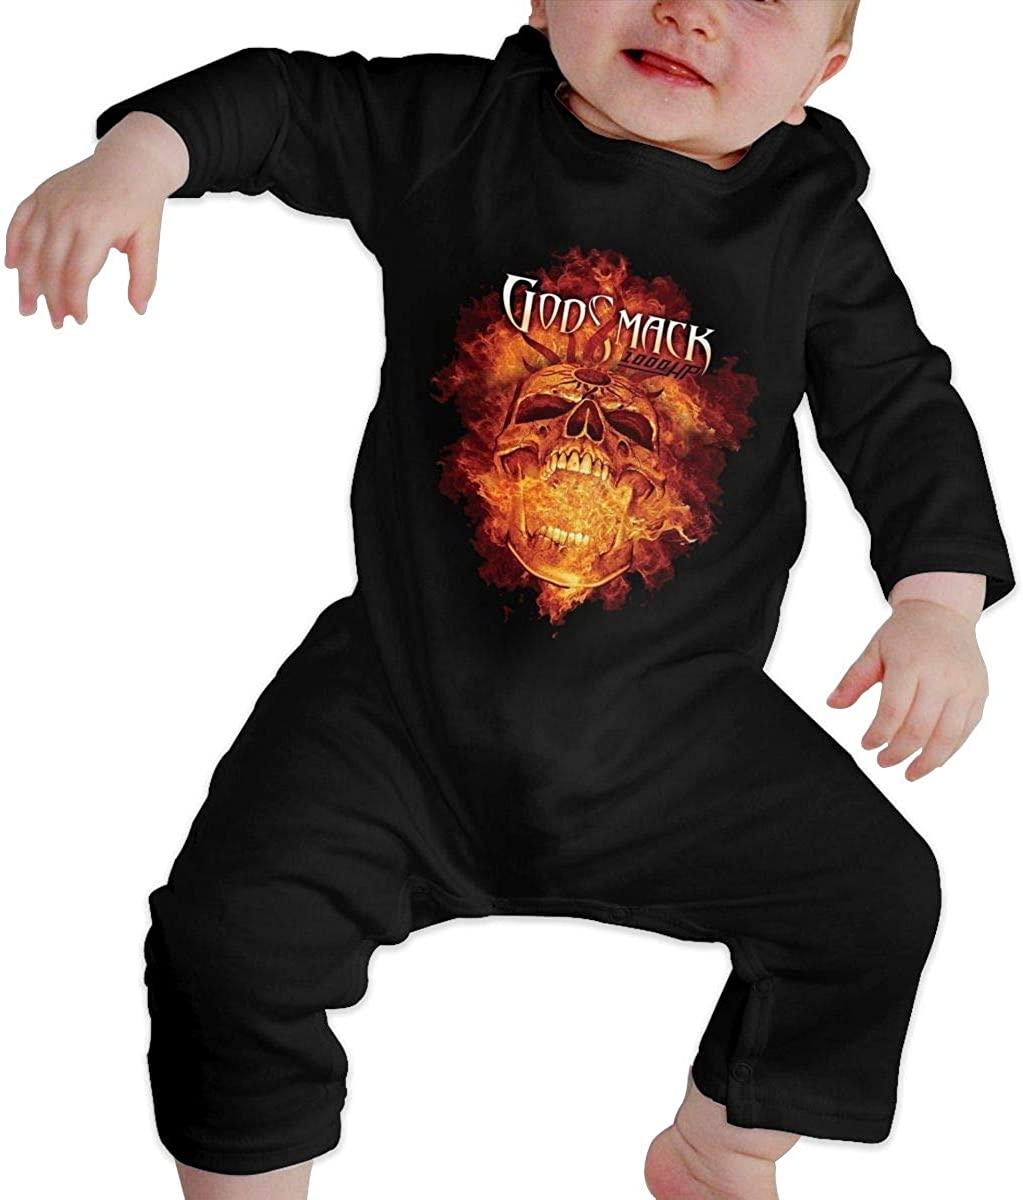 Qq1-asd-store Godsmack Boys/Girls Baby Cotton Long Sleeve Romper Warm Bodysuit